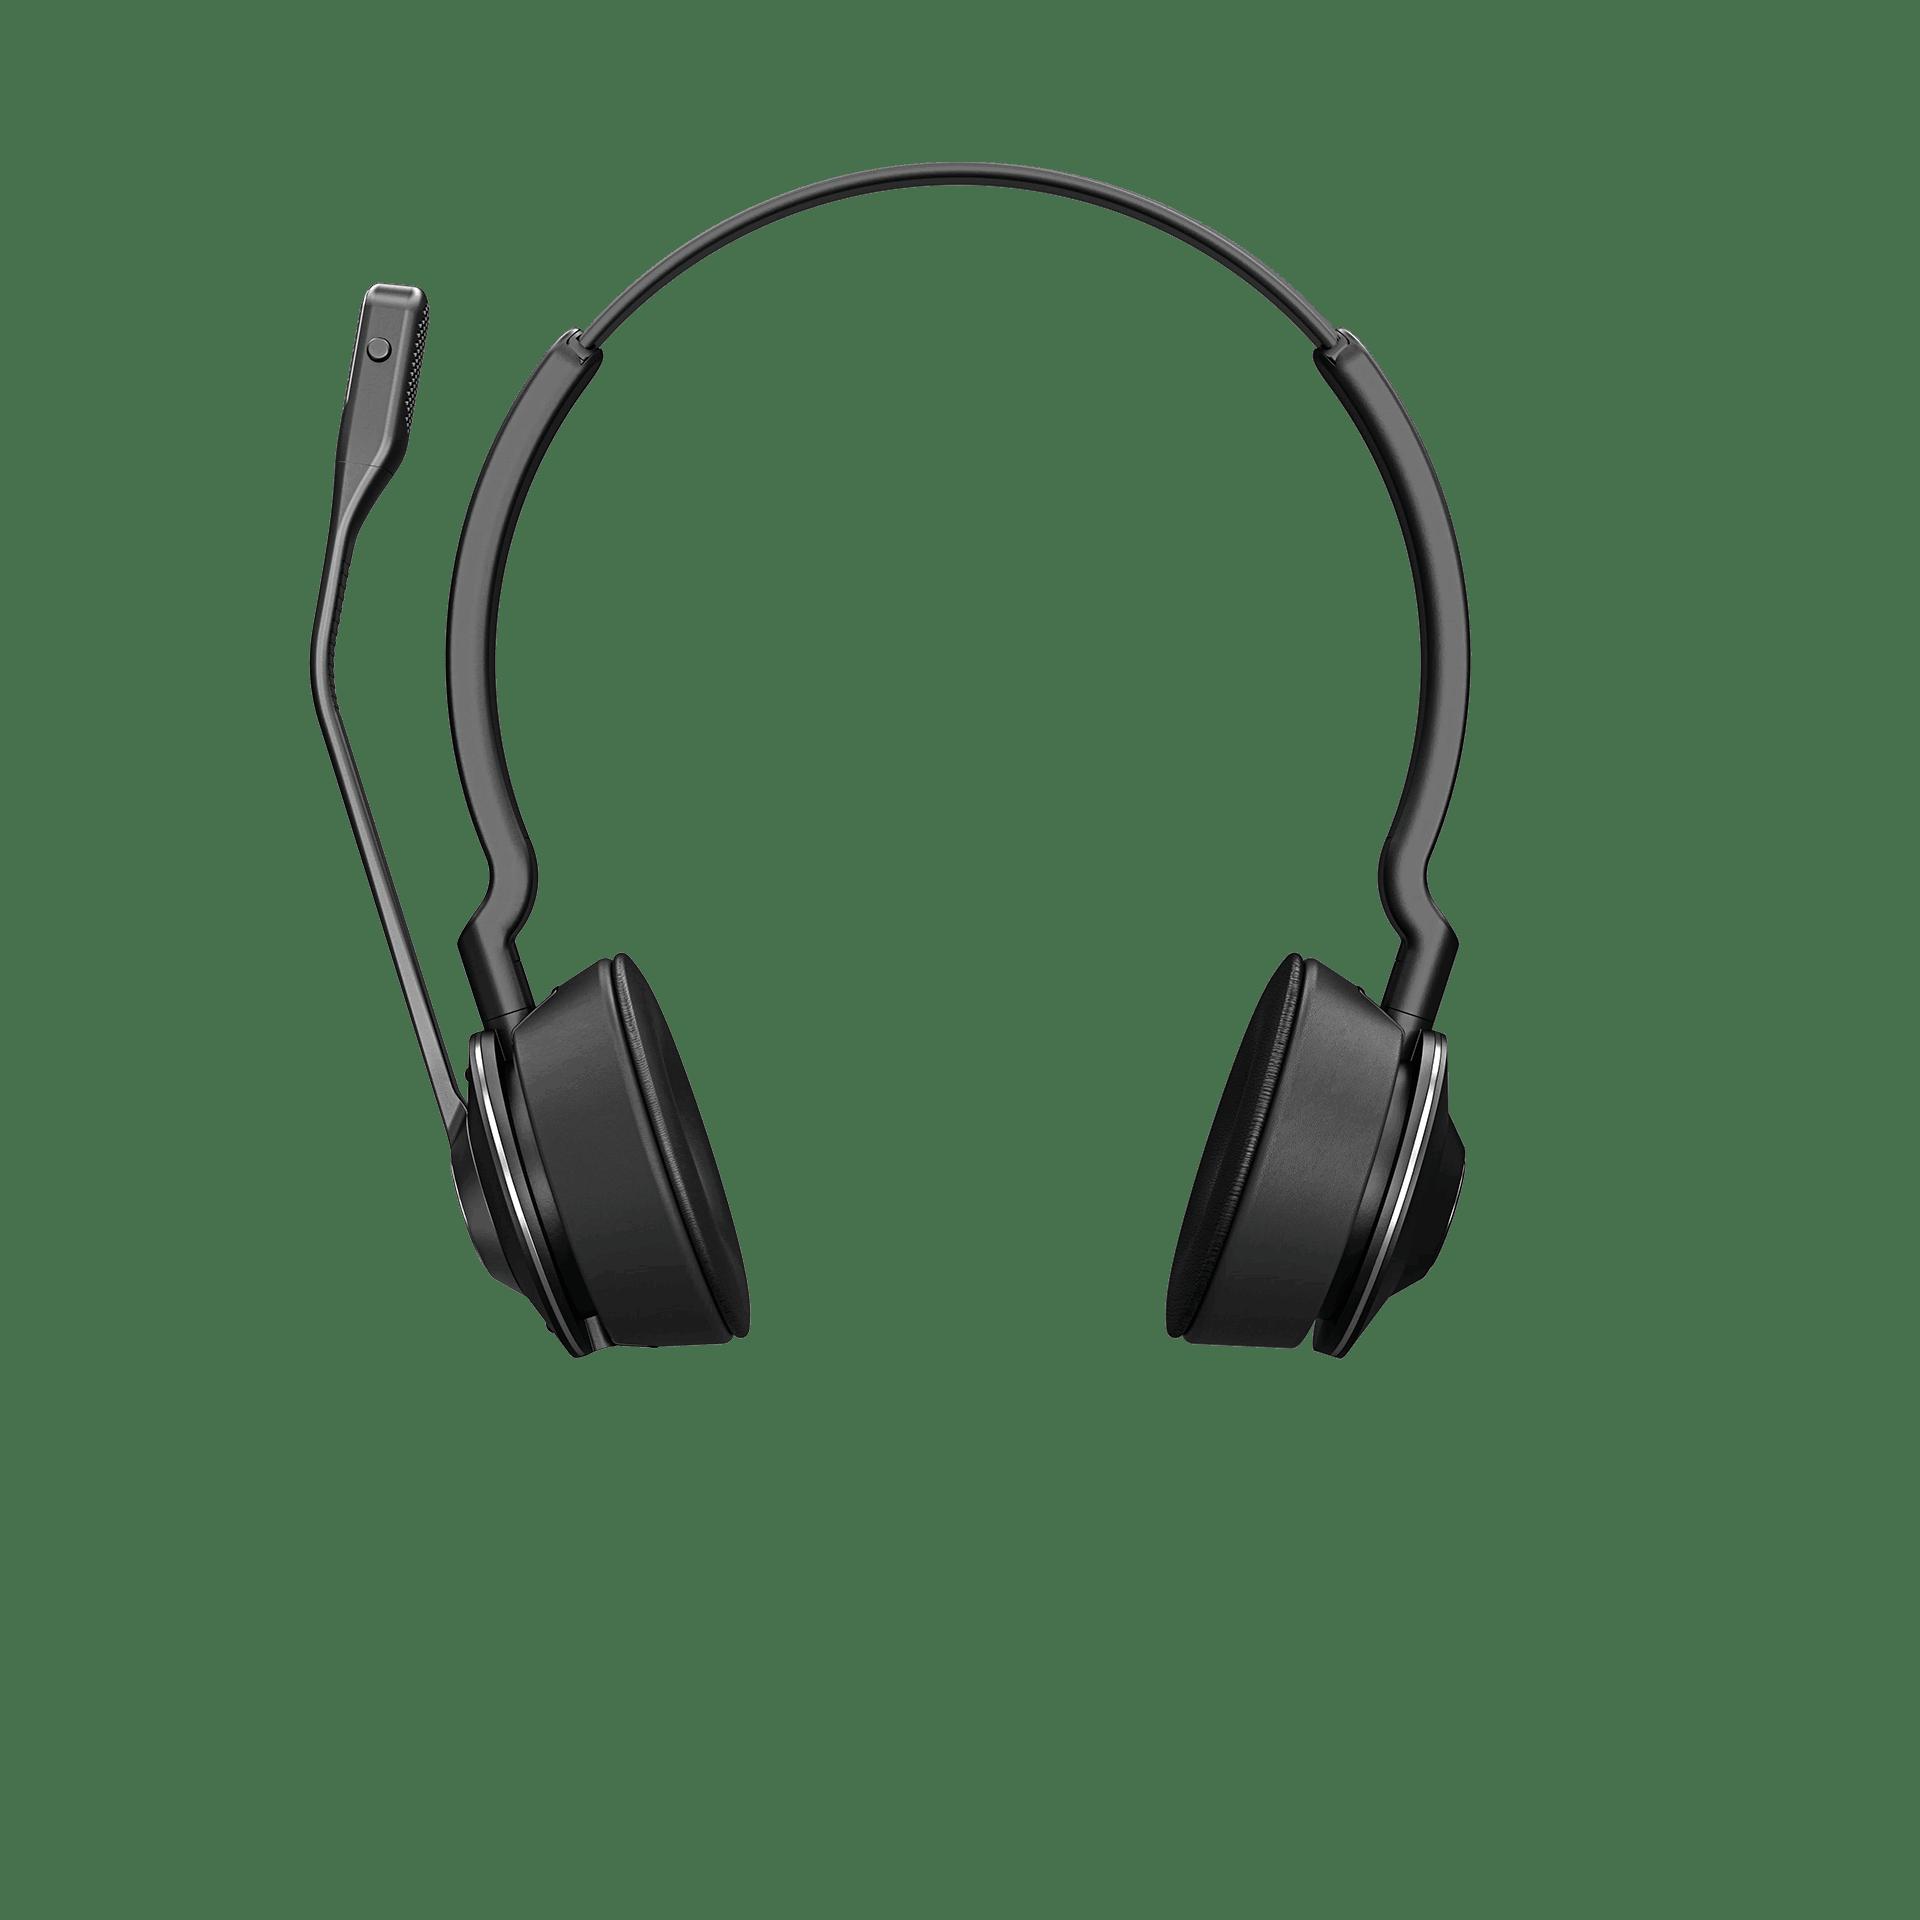 Jabra Engage 65 Stereo Wireless Headset 9559 553 125 Headsets Direct Inc